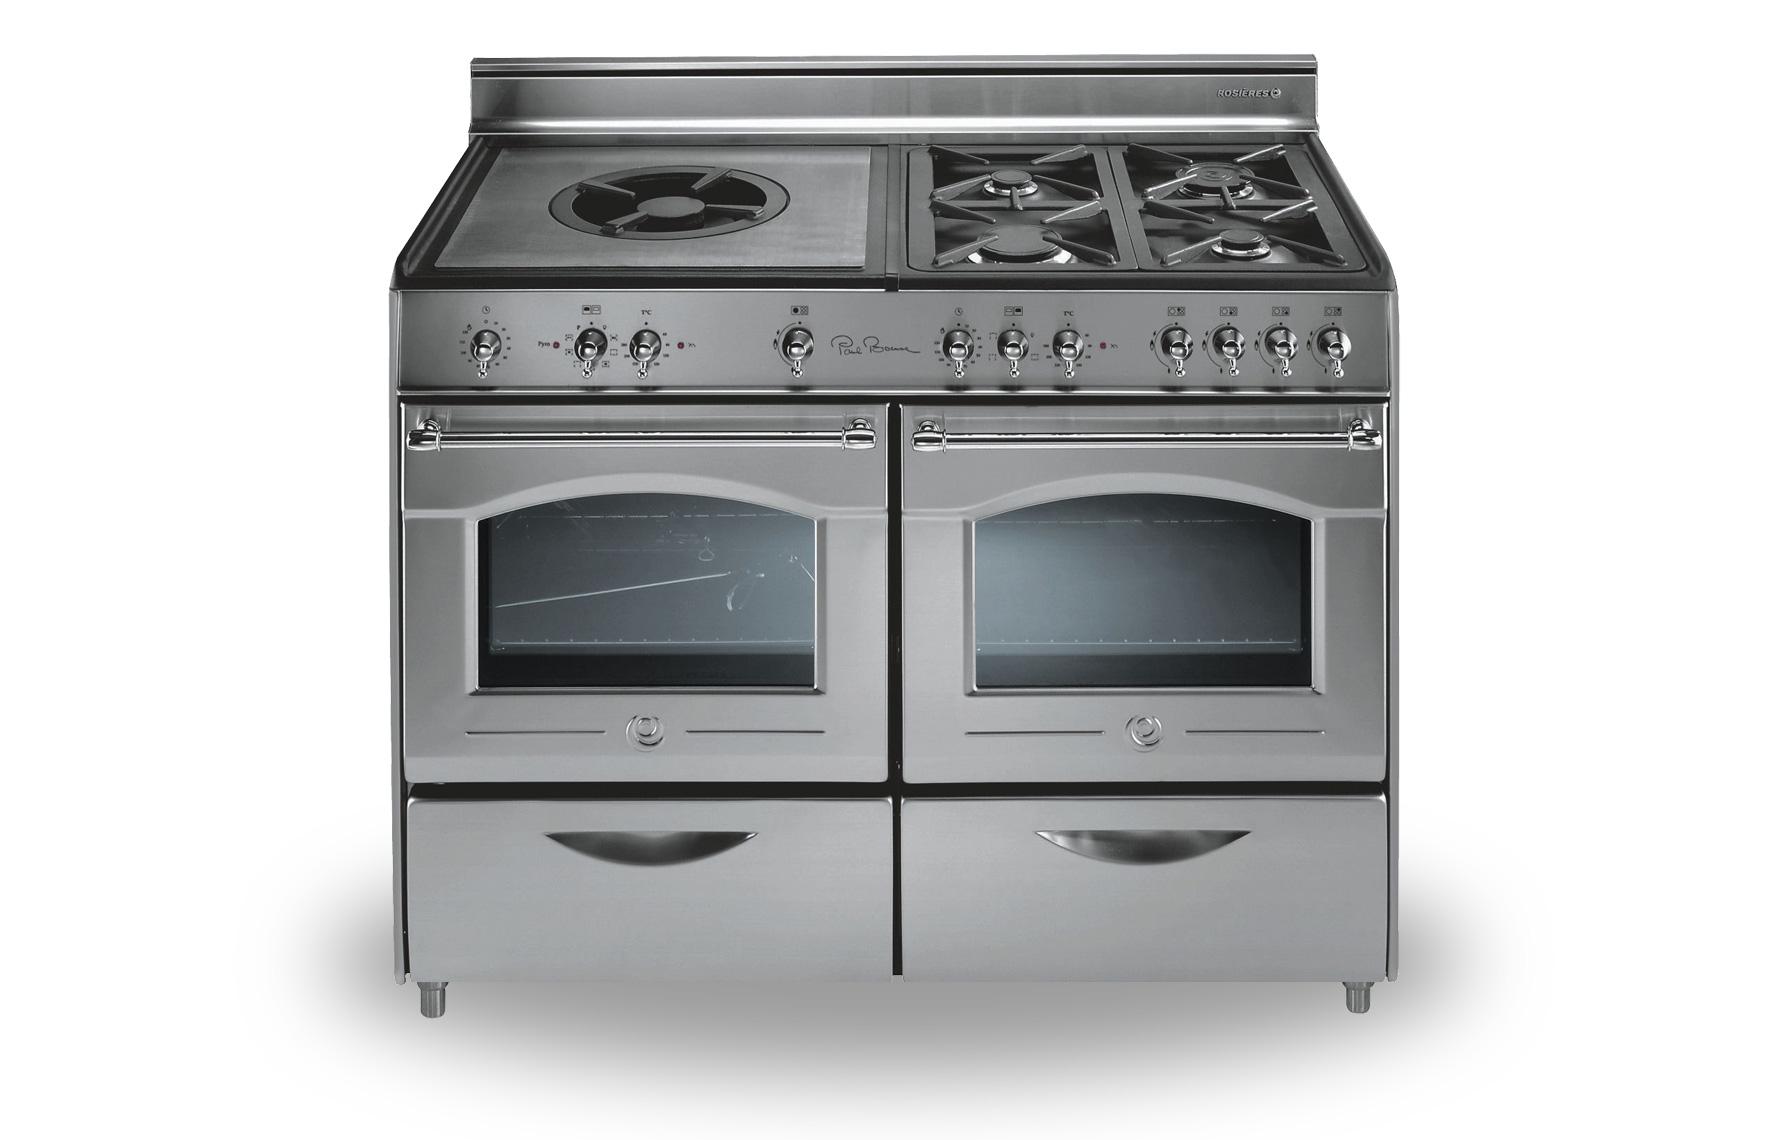 rosi 232 res bocuse tradis range cookers rangecookers co uk